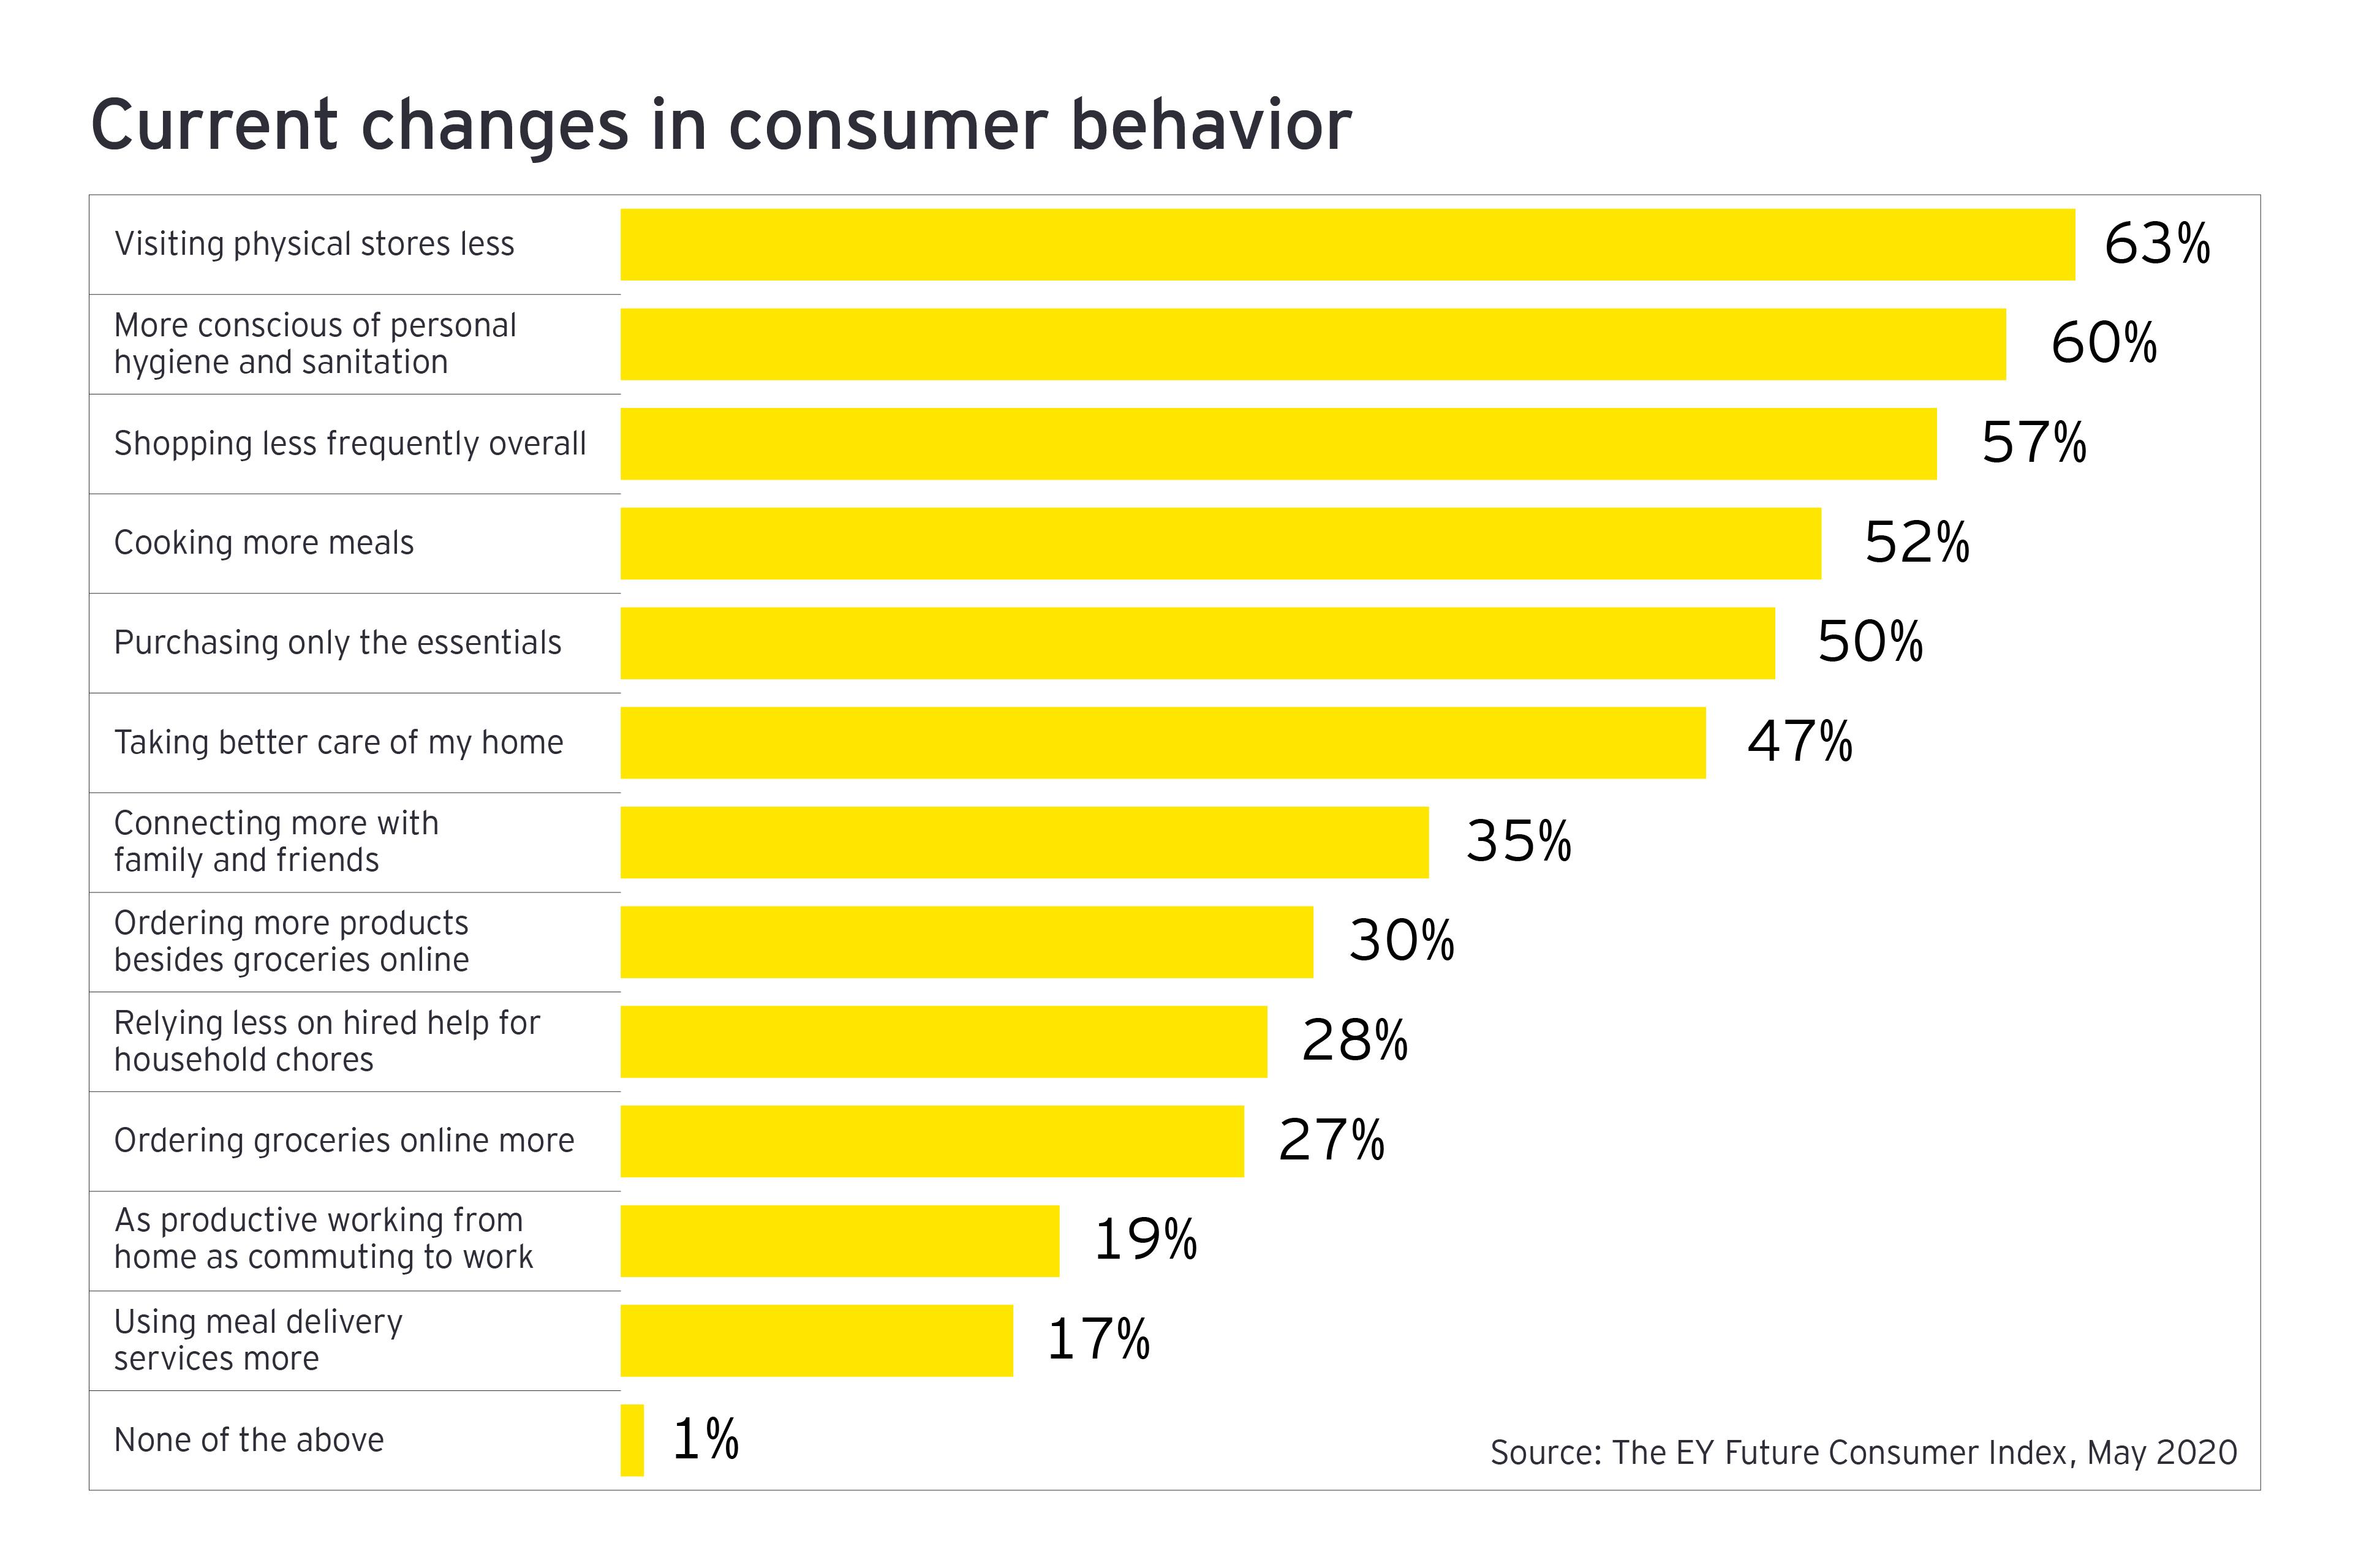 Current changes in consumer behavior